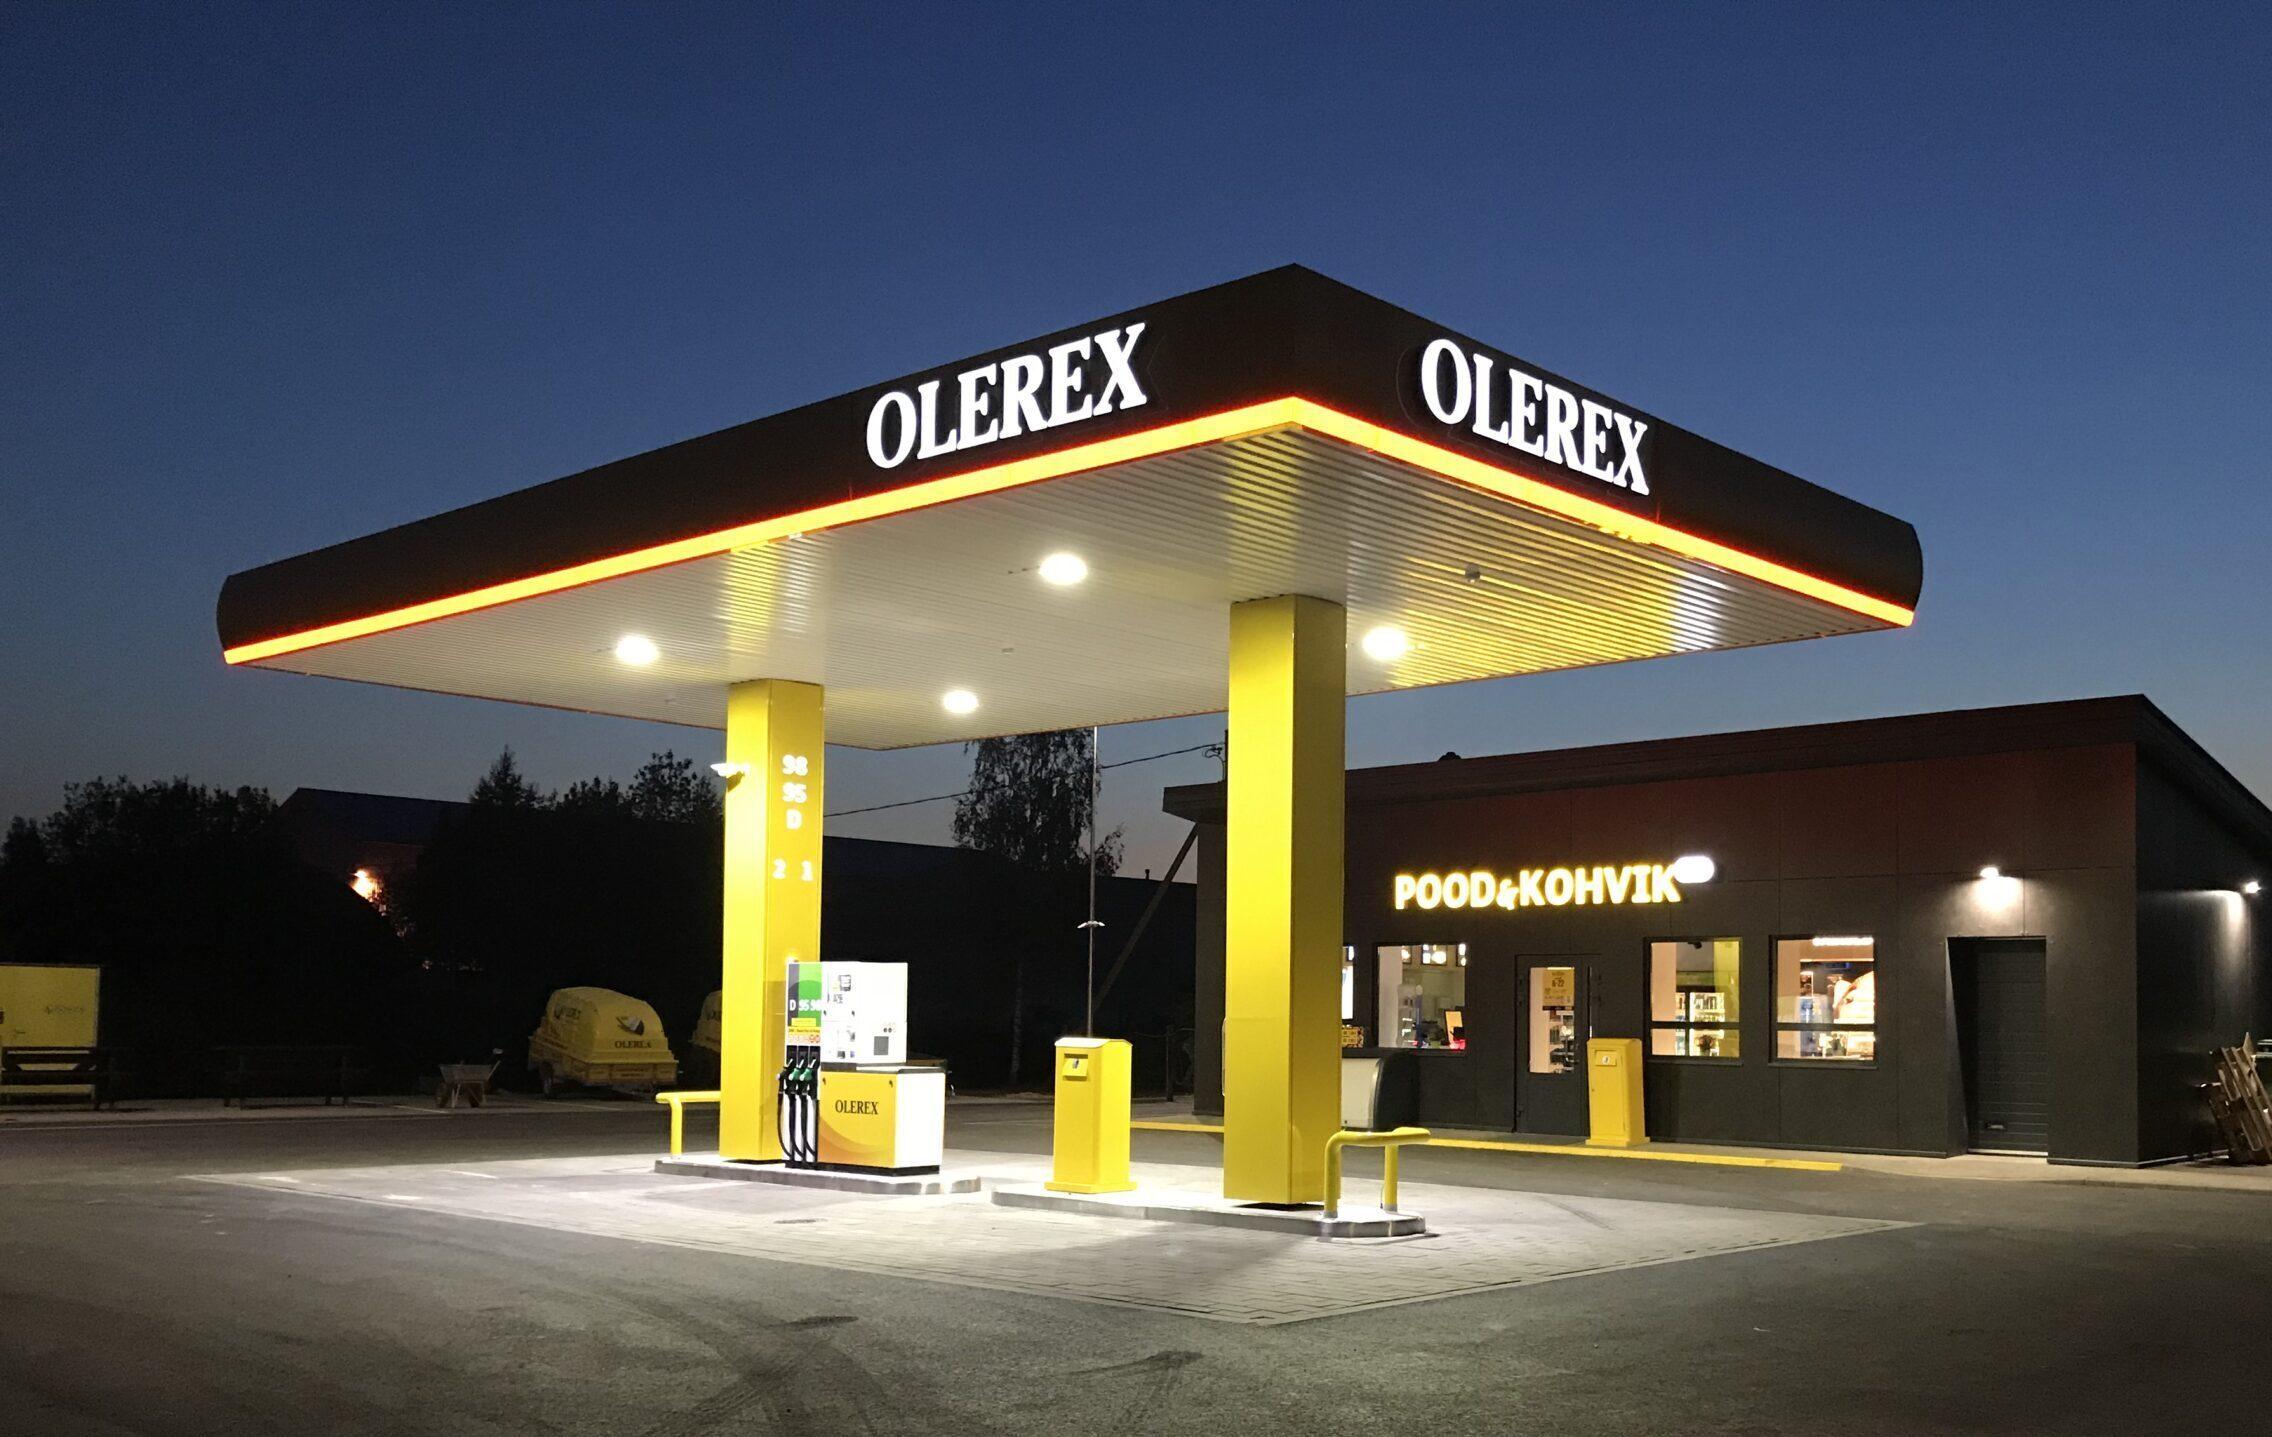 OLEREX teenindusjaam-tankla